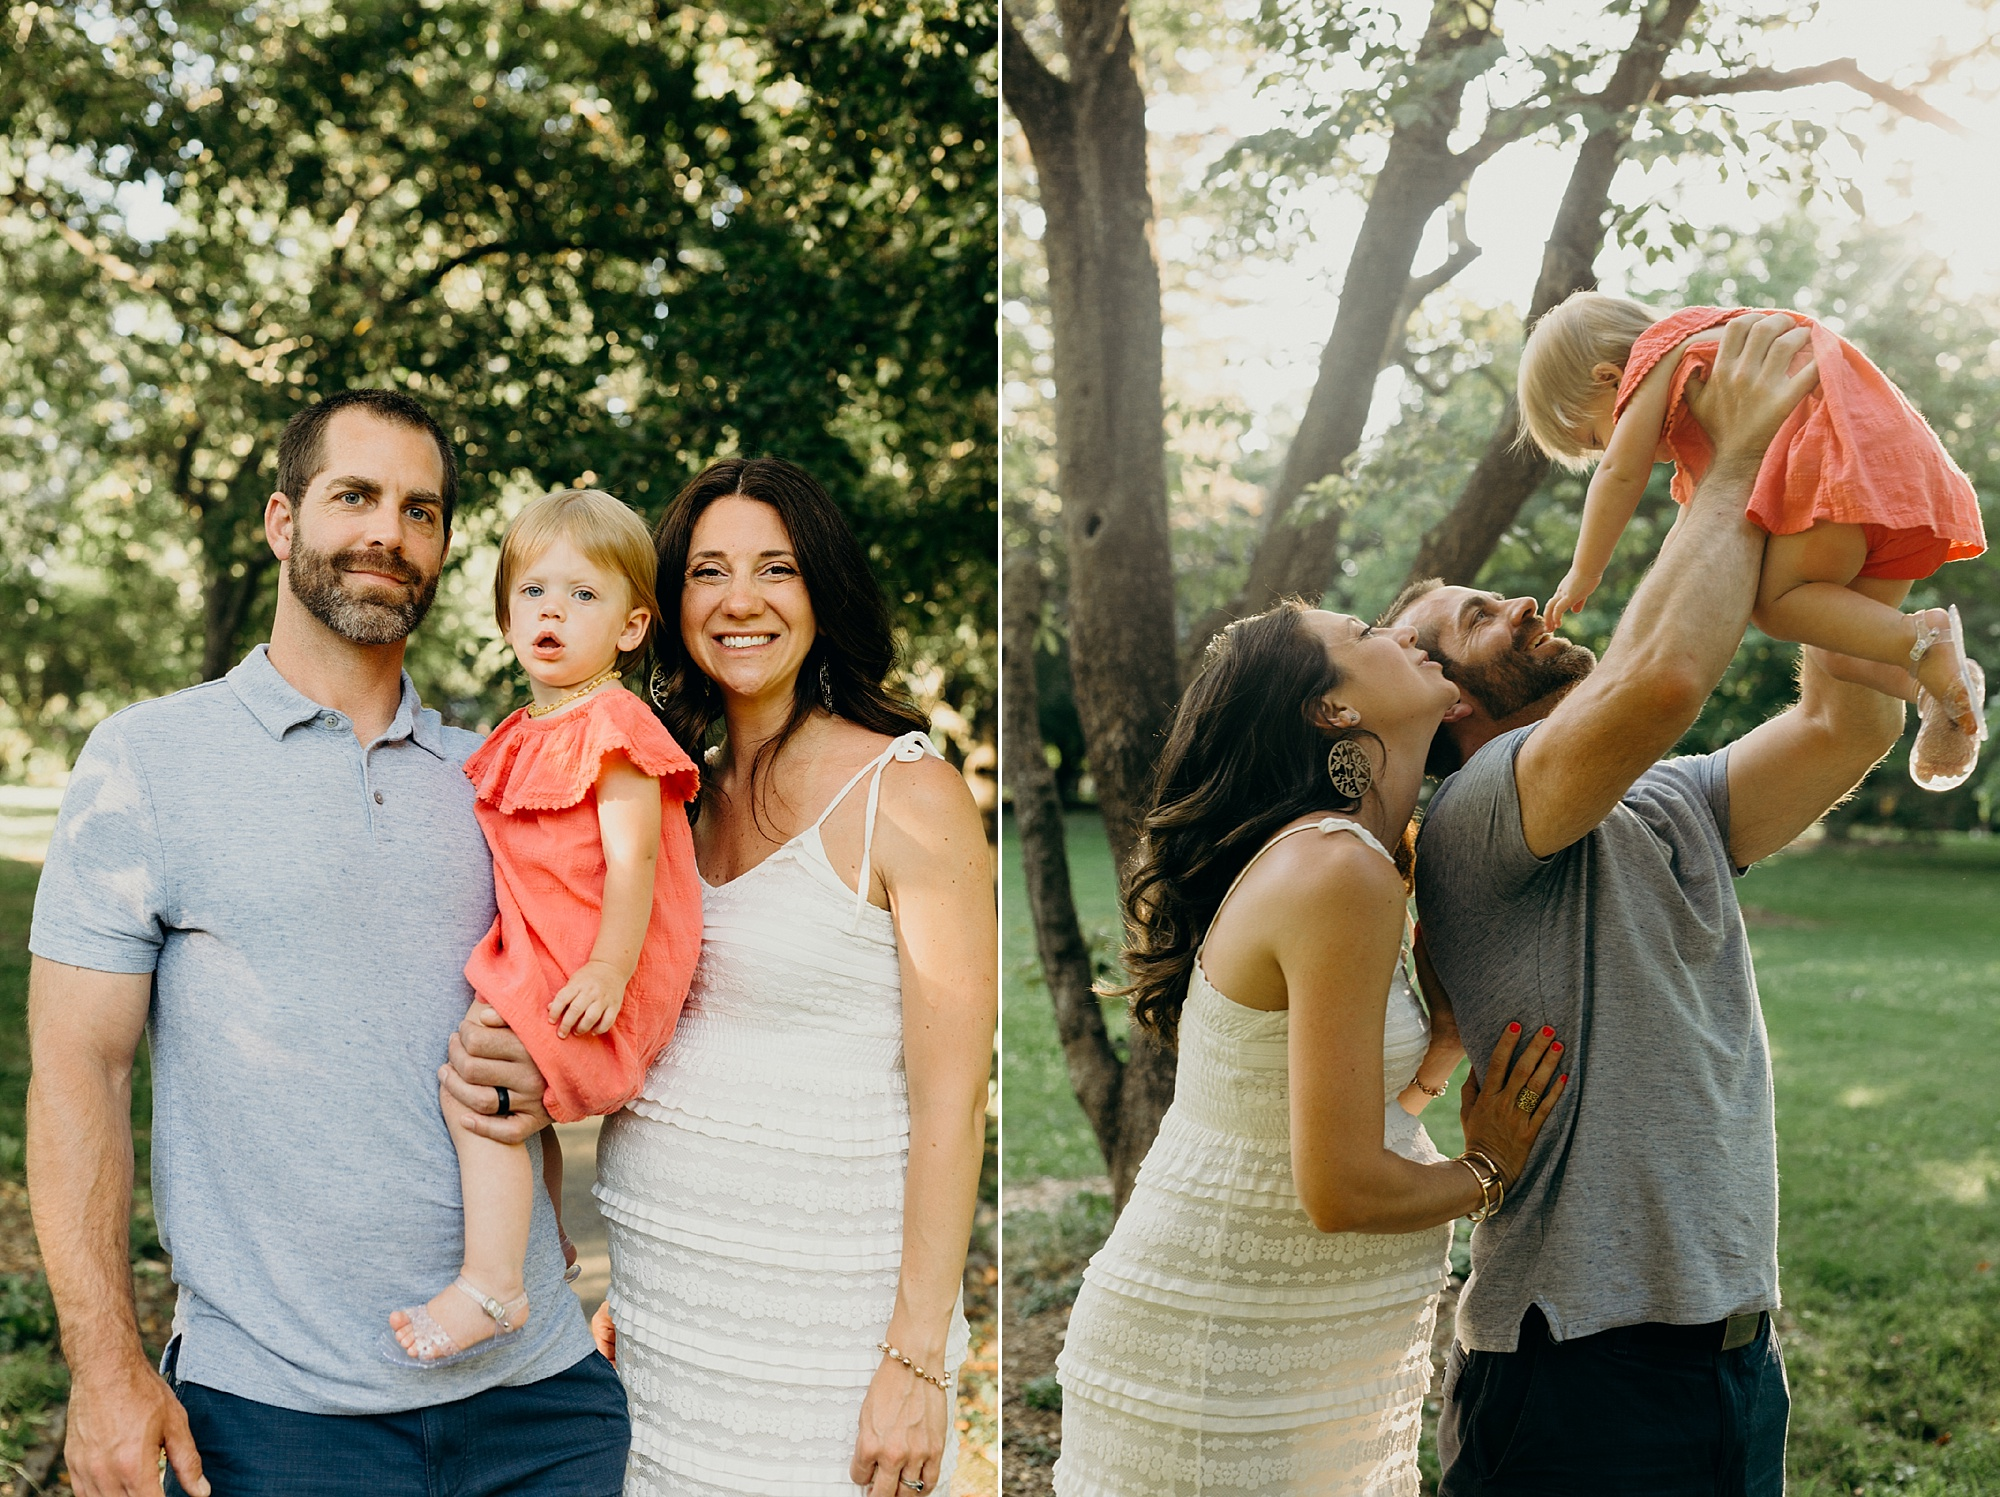 Joe_Mac_Creative_Maternity_West_Chester_Wedding_Photography_Philly_Best_Philadlephia__0123.jpg